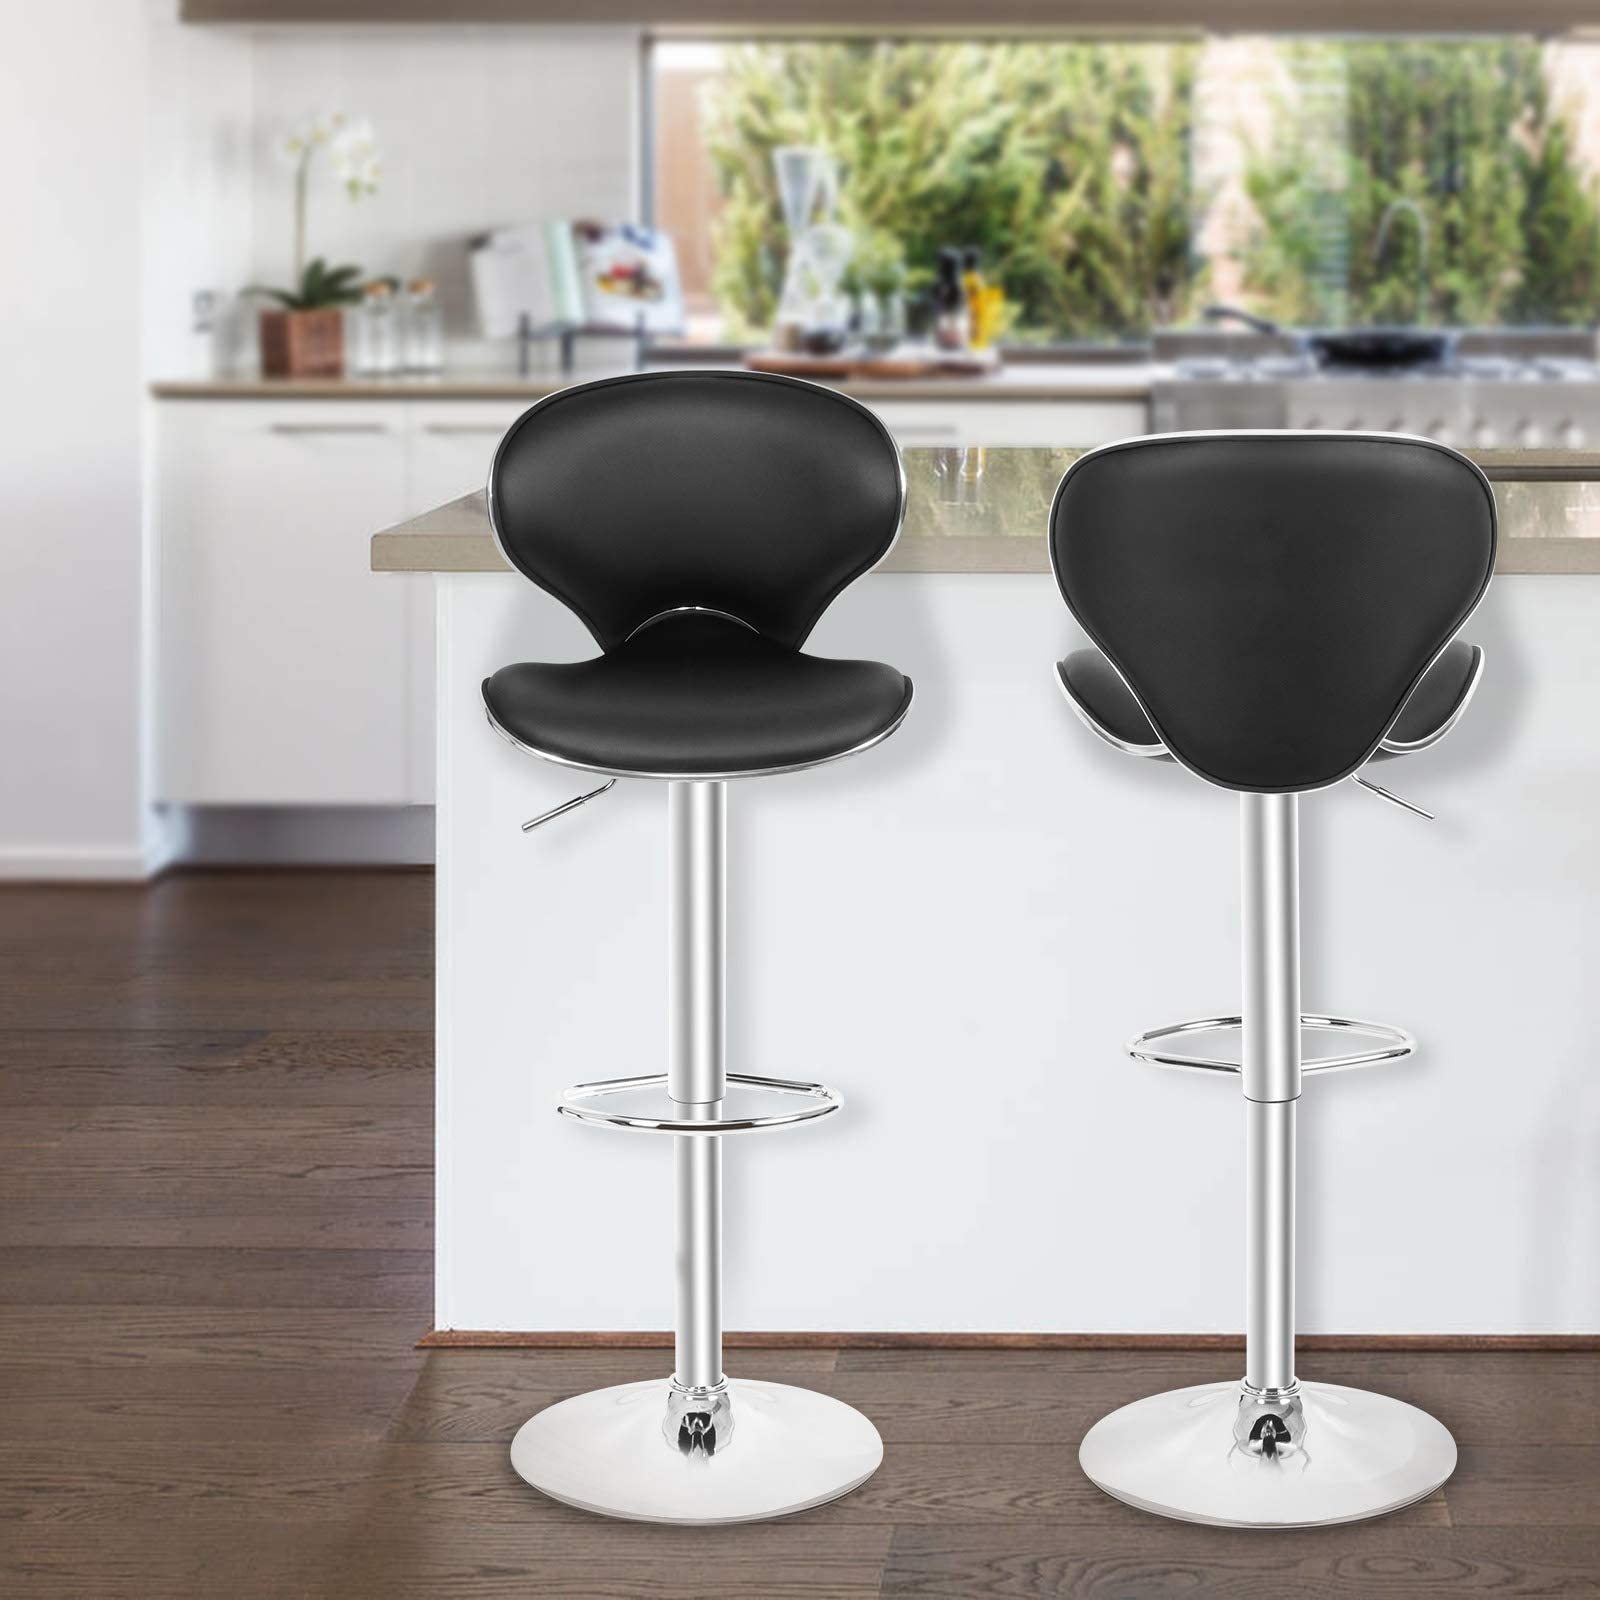 the range grey bar stools> OFF 9